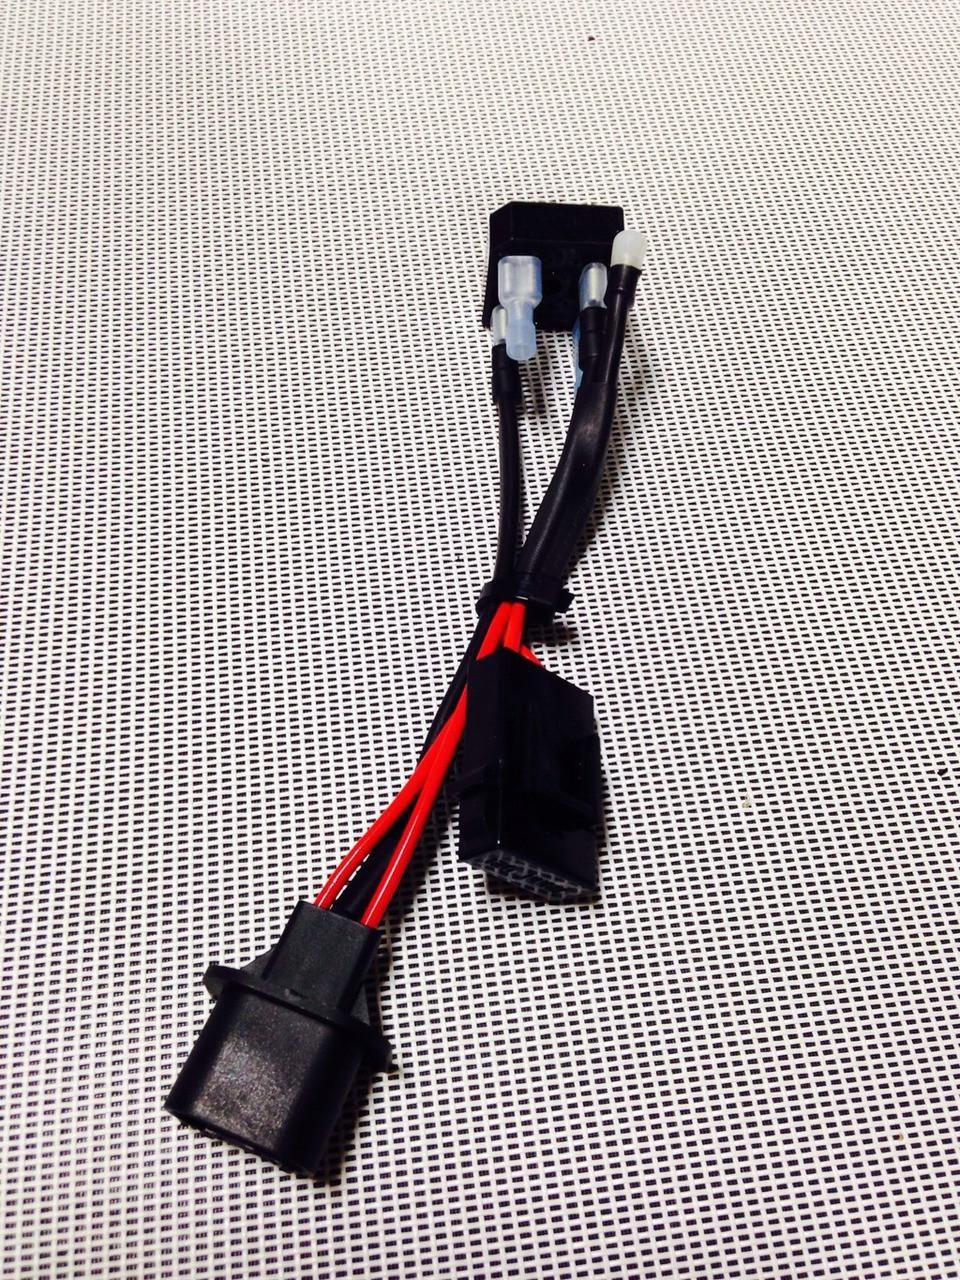 polaris proride plug n play led wiring harness mountain fit hoods polaris general wiring harness polaris wiring harness [ 960 x 1280 Pixel ]